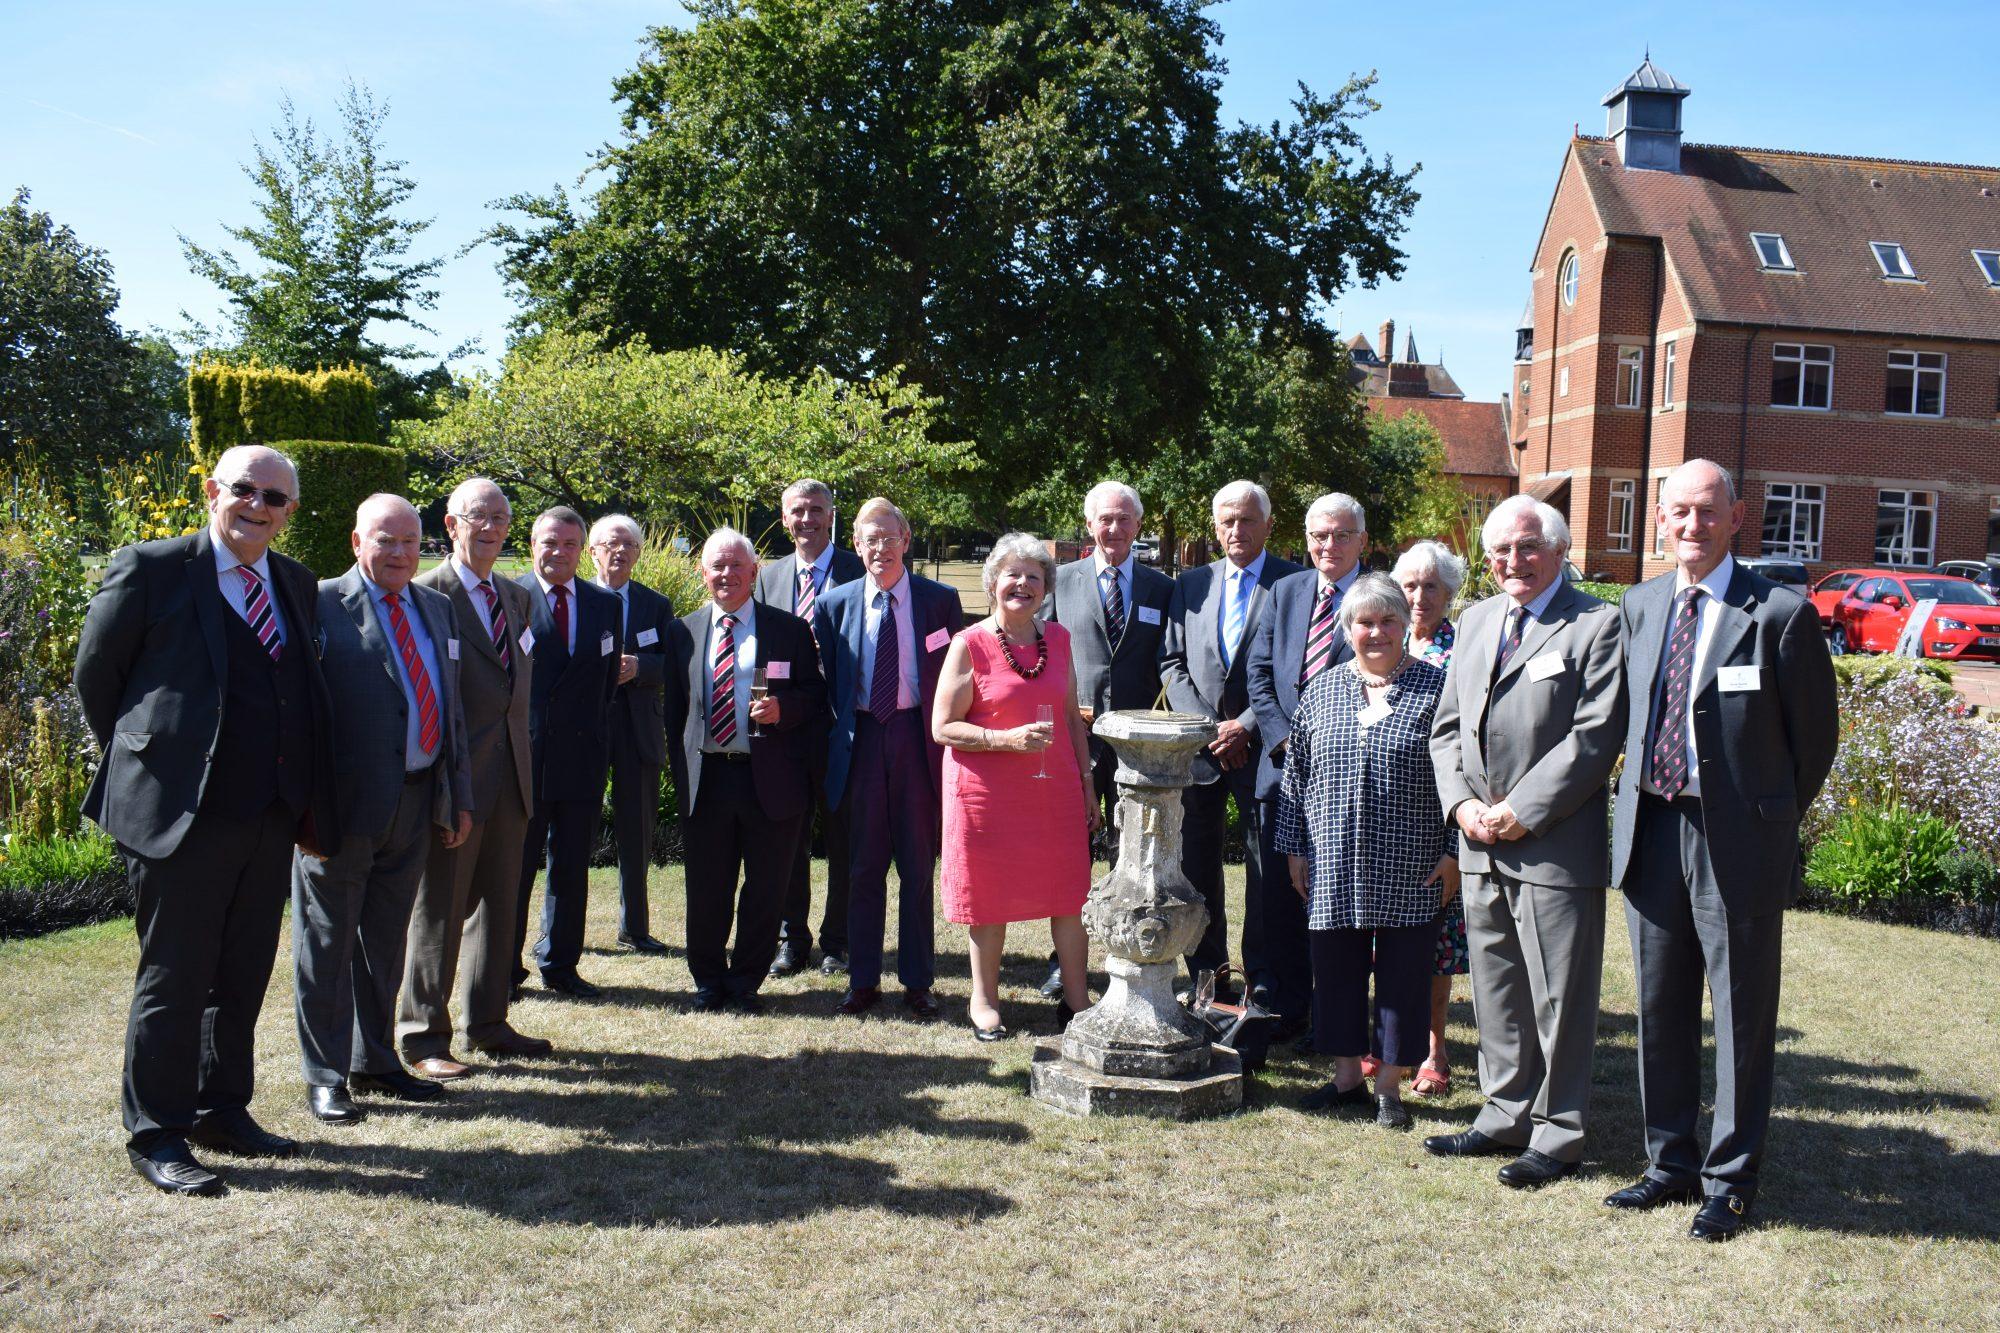 Abingdon School Legacies